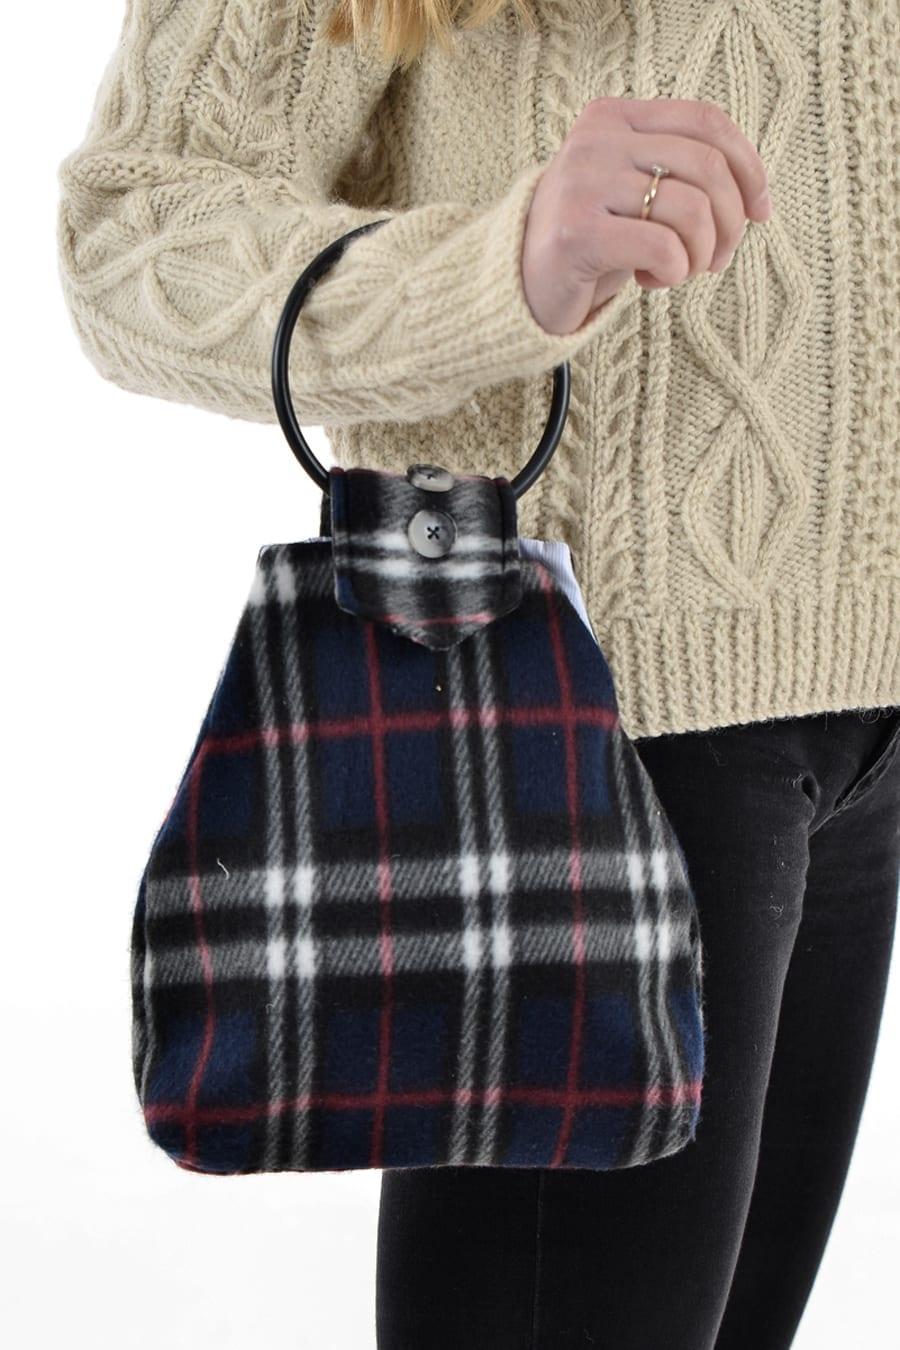 Vintage 1930's inspired handbag